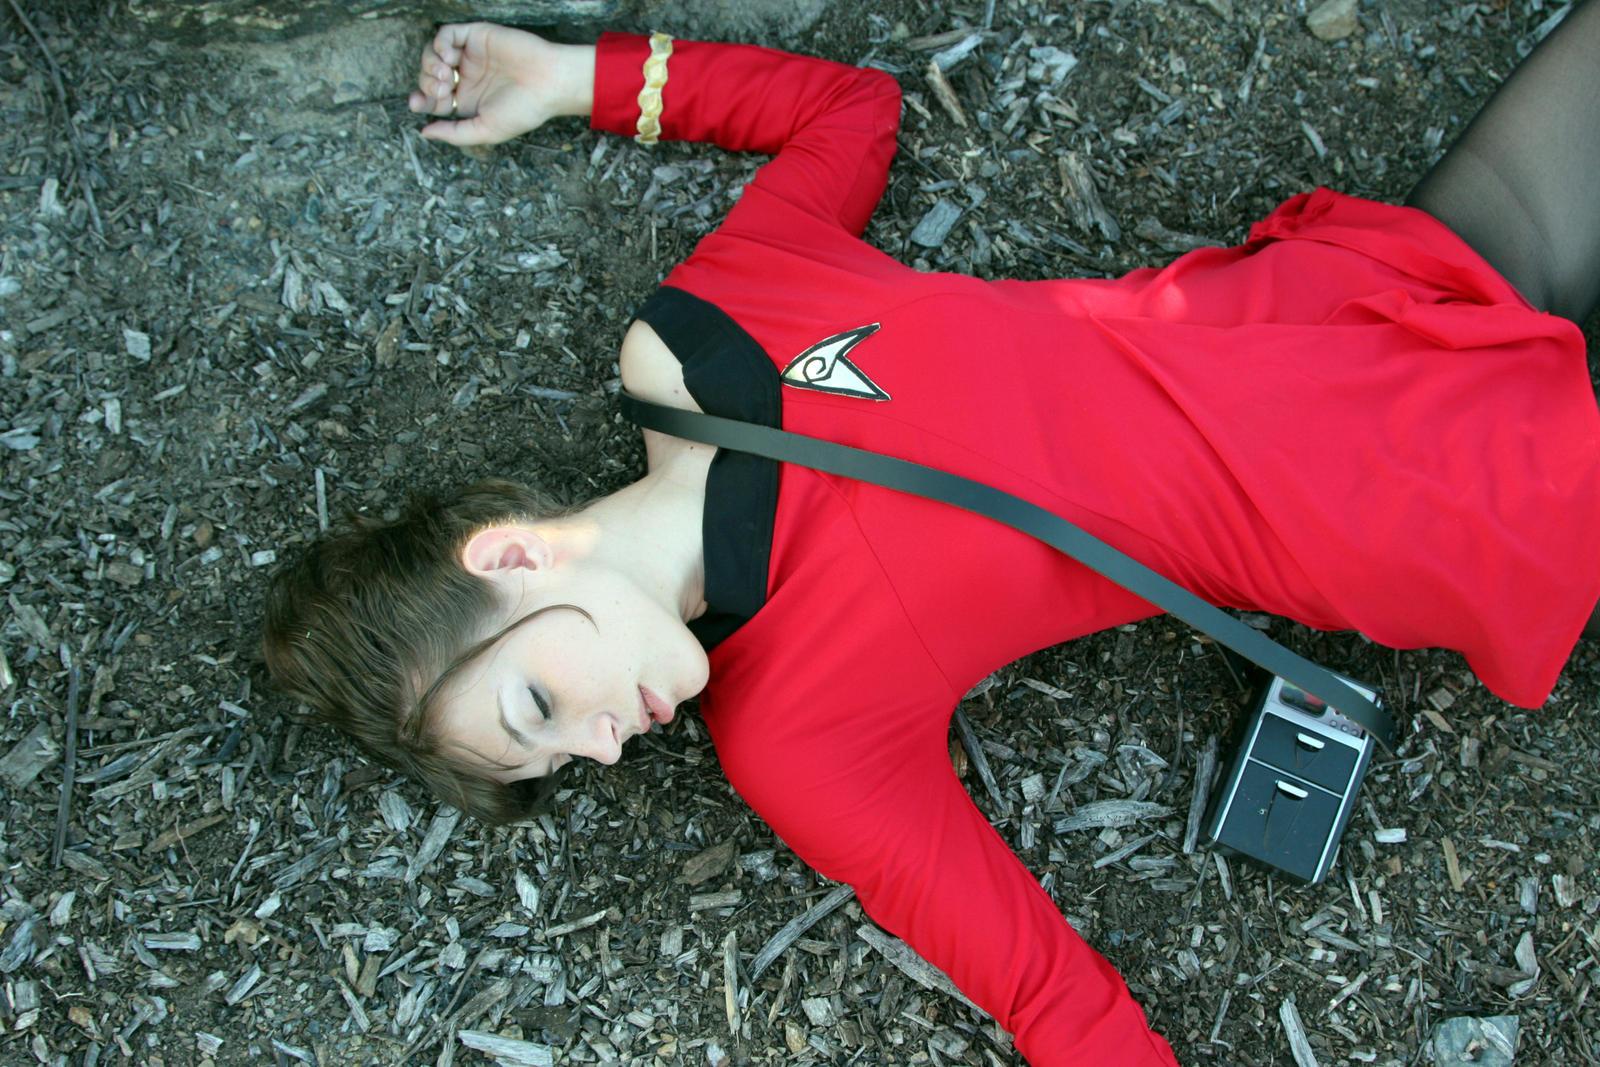 Star Trek Series 2 - 40